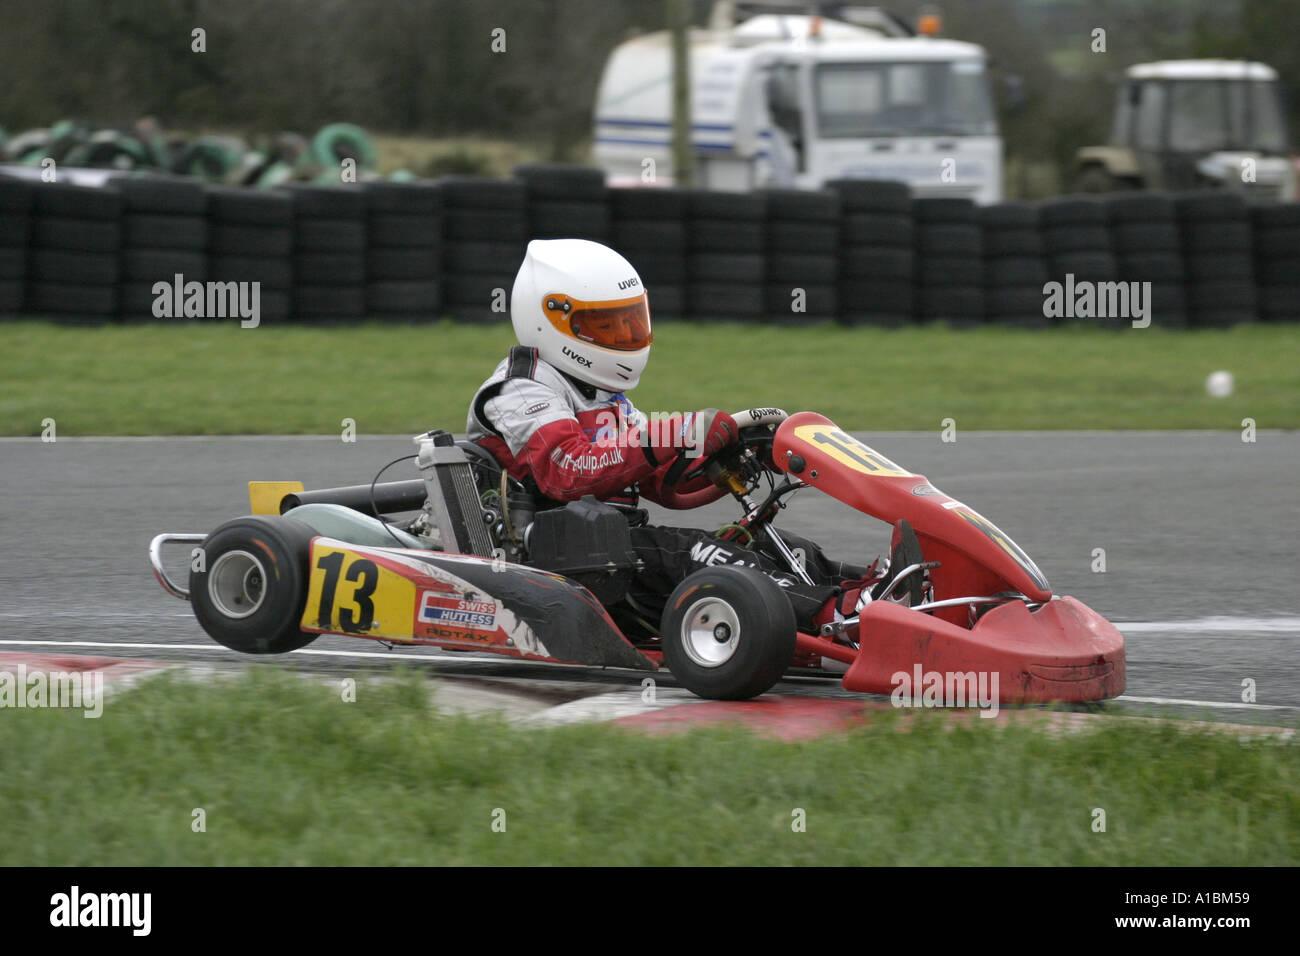 kart over ireland Mini Max kart driver rides over the kerb corner at Nutts Corner  kart over ireland